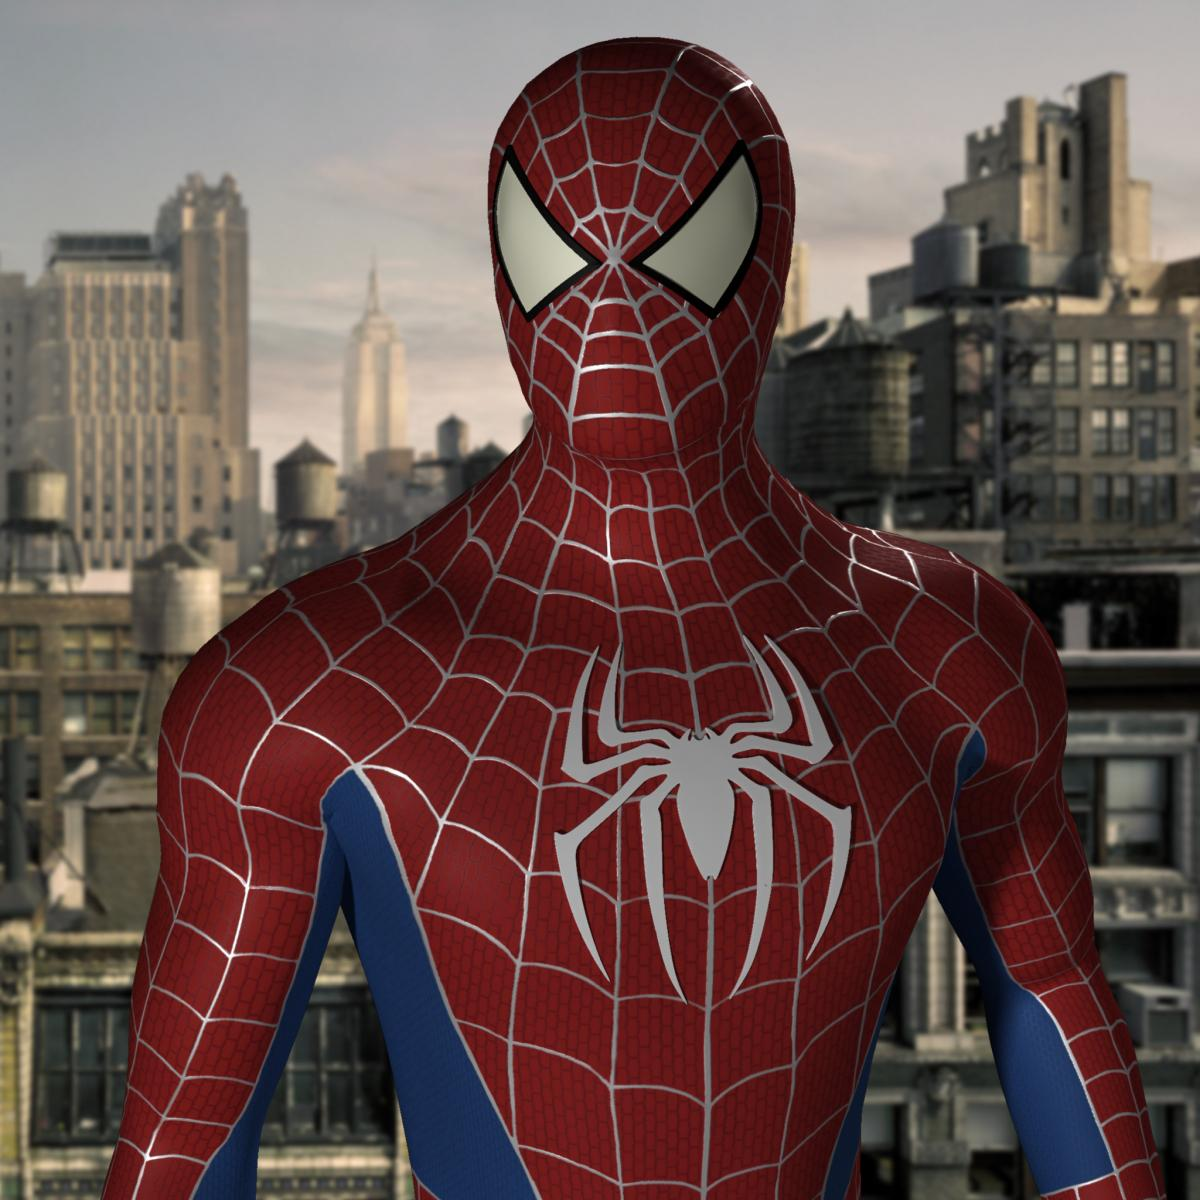 3d model of Spiderman turbosquid